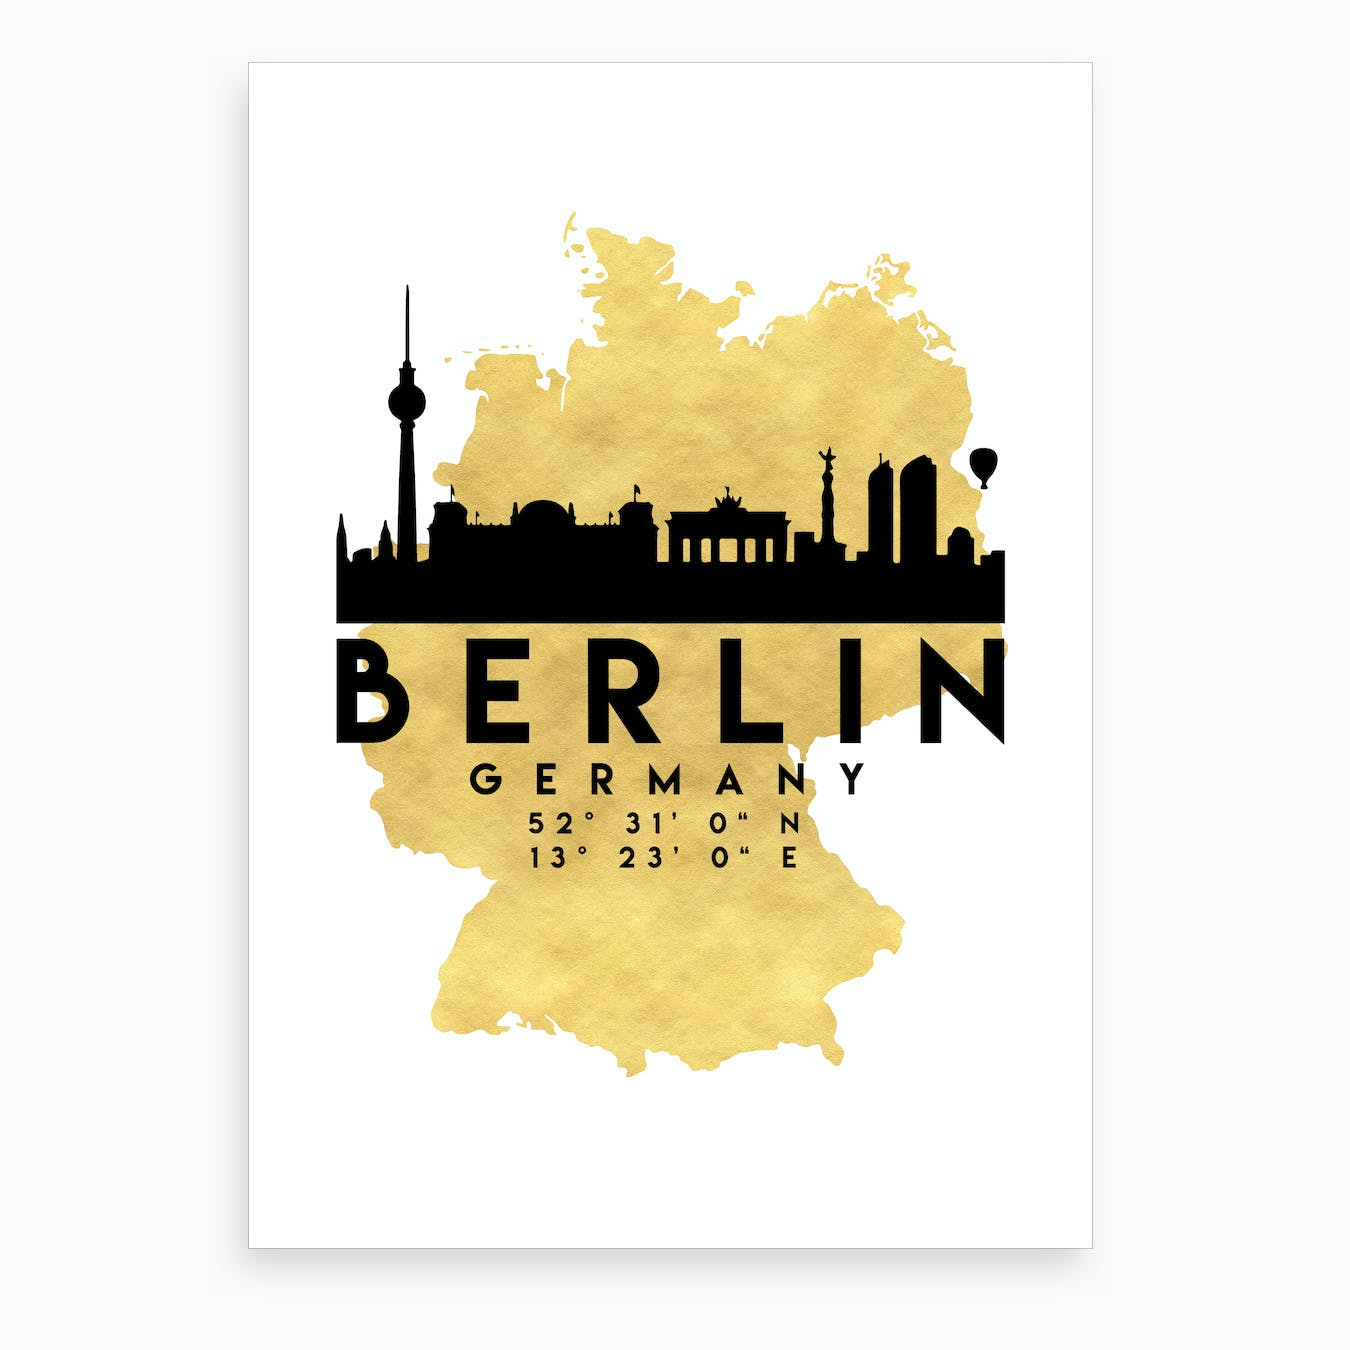 Berlin Germany Silhouette City Skyline Map